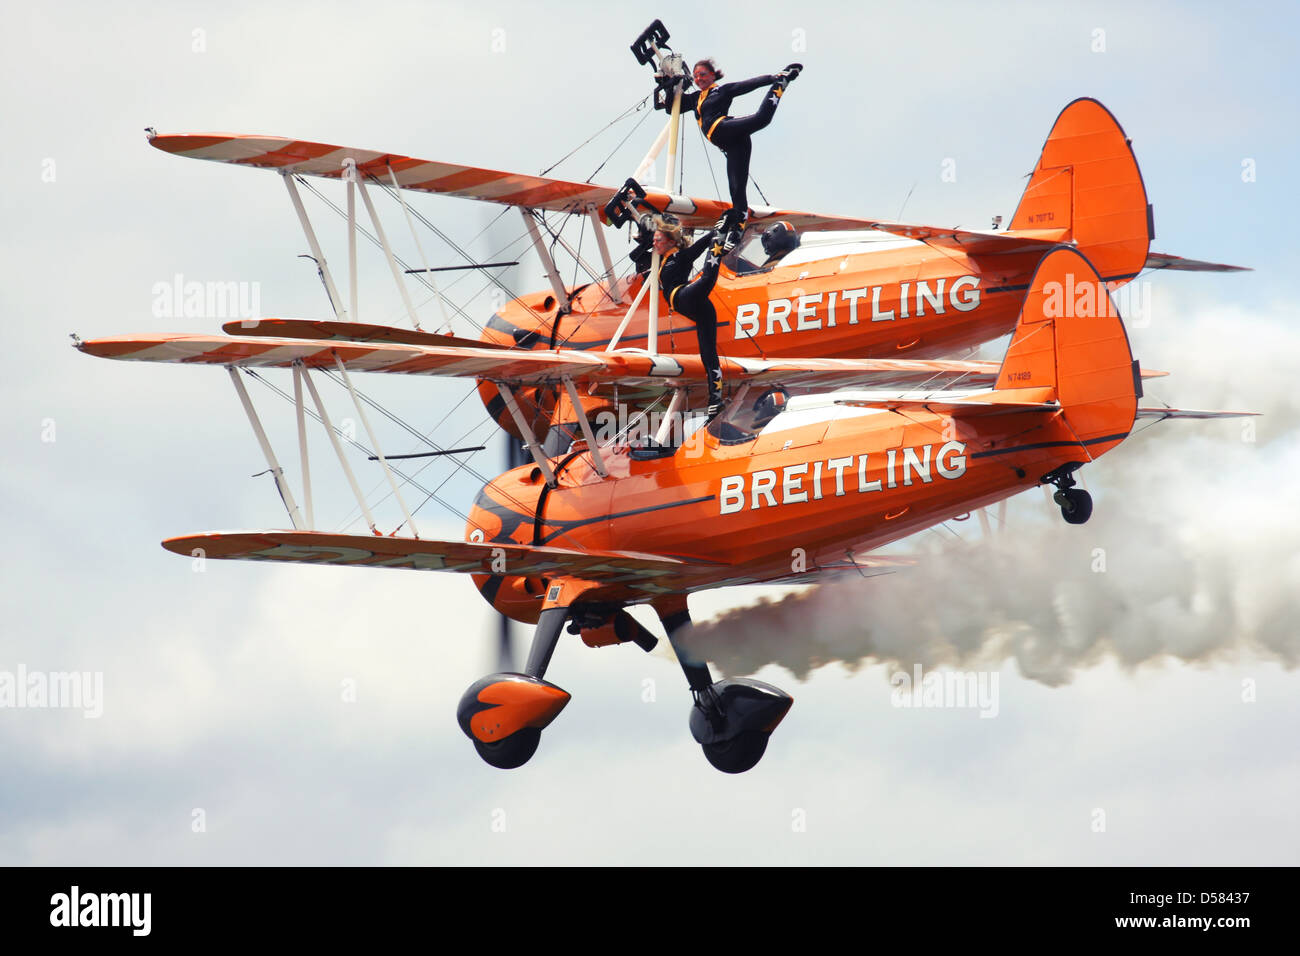 Breitling Wingwalkers British aerobatics and wingwalking team performing at Farnborough Airshow 2012, UK - Stock Image